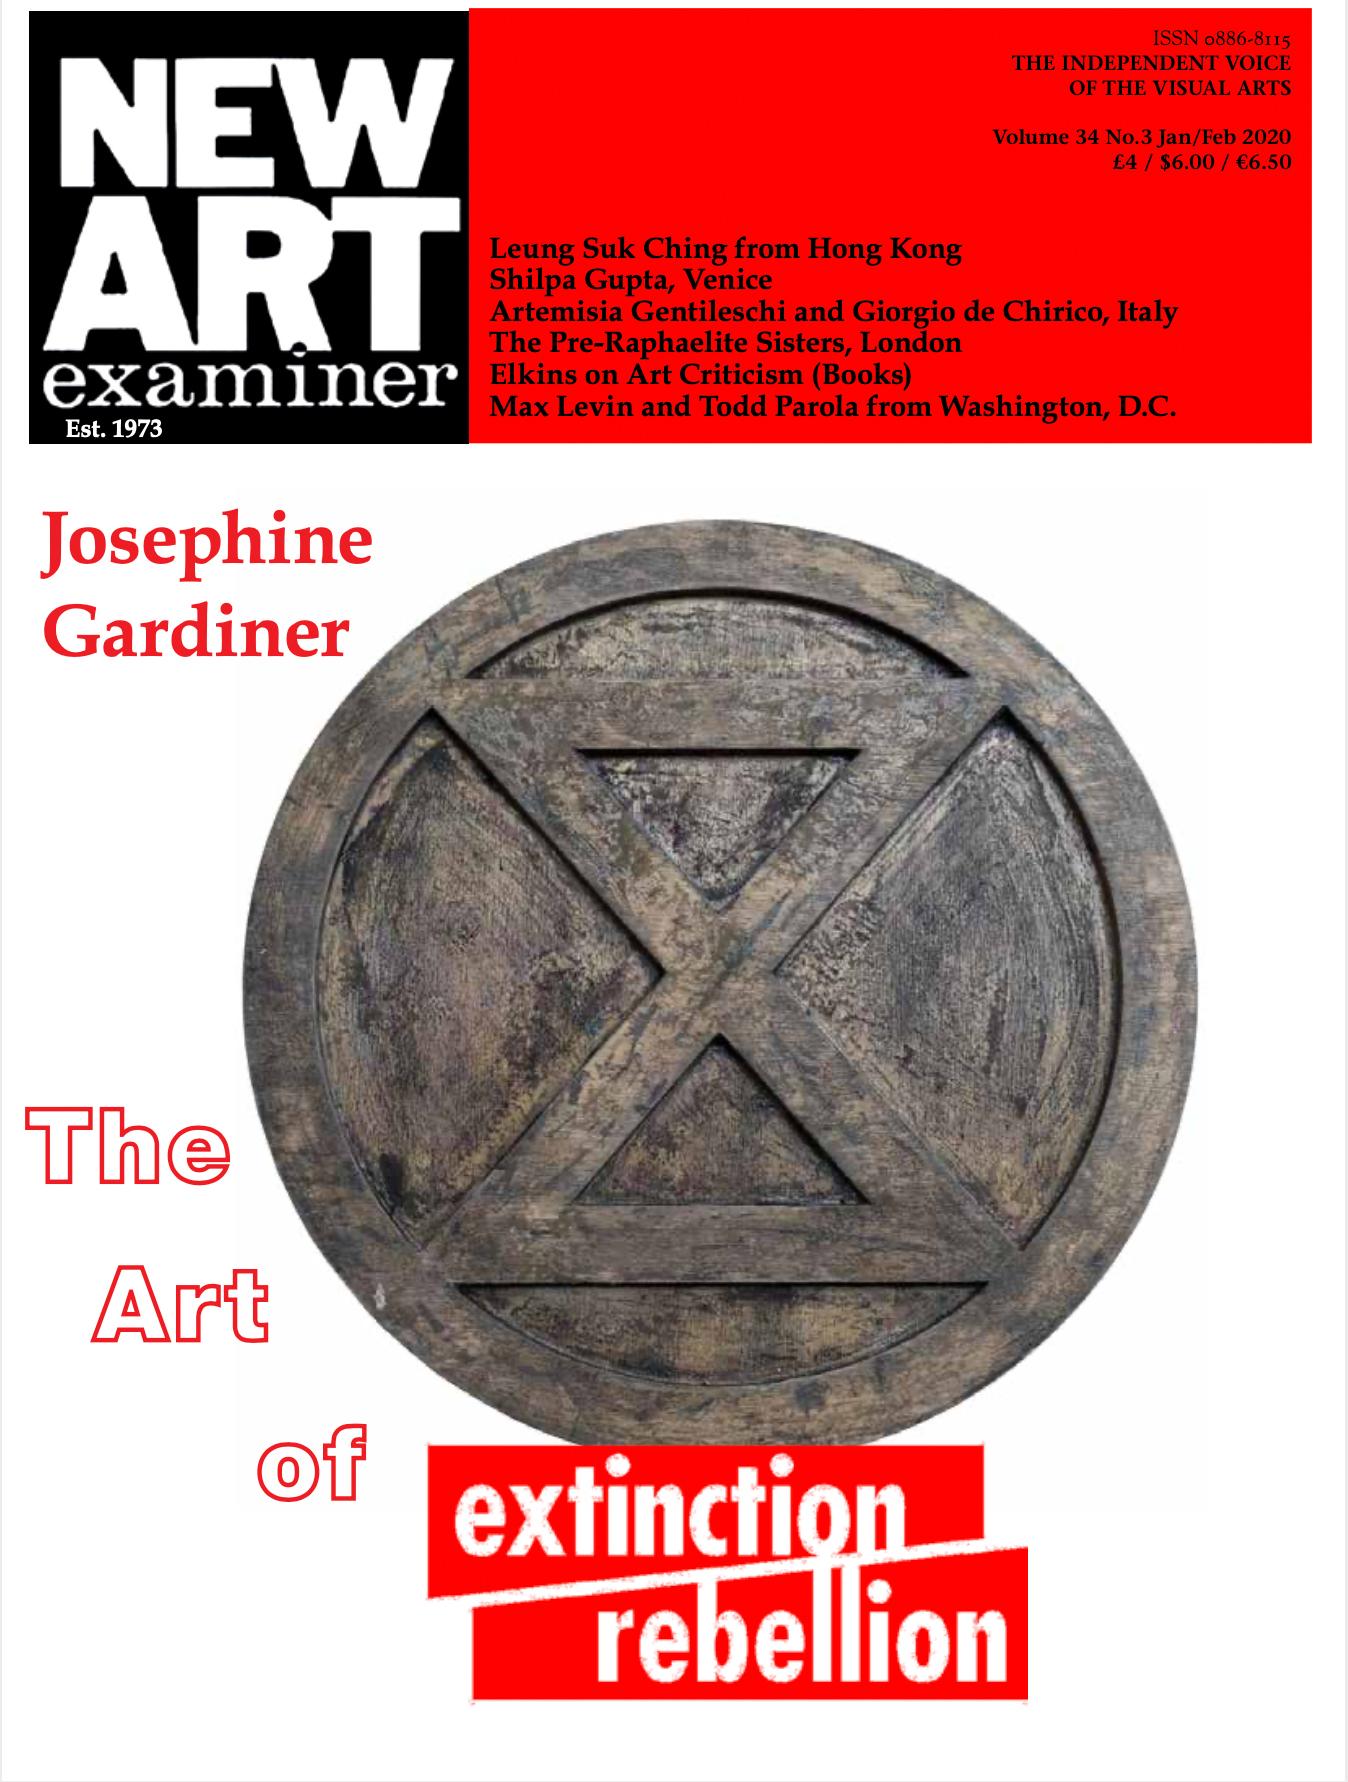 Alexander Stanfield at New Art Examiner